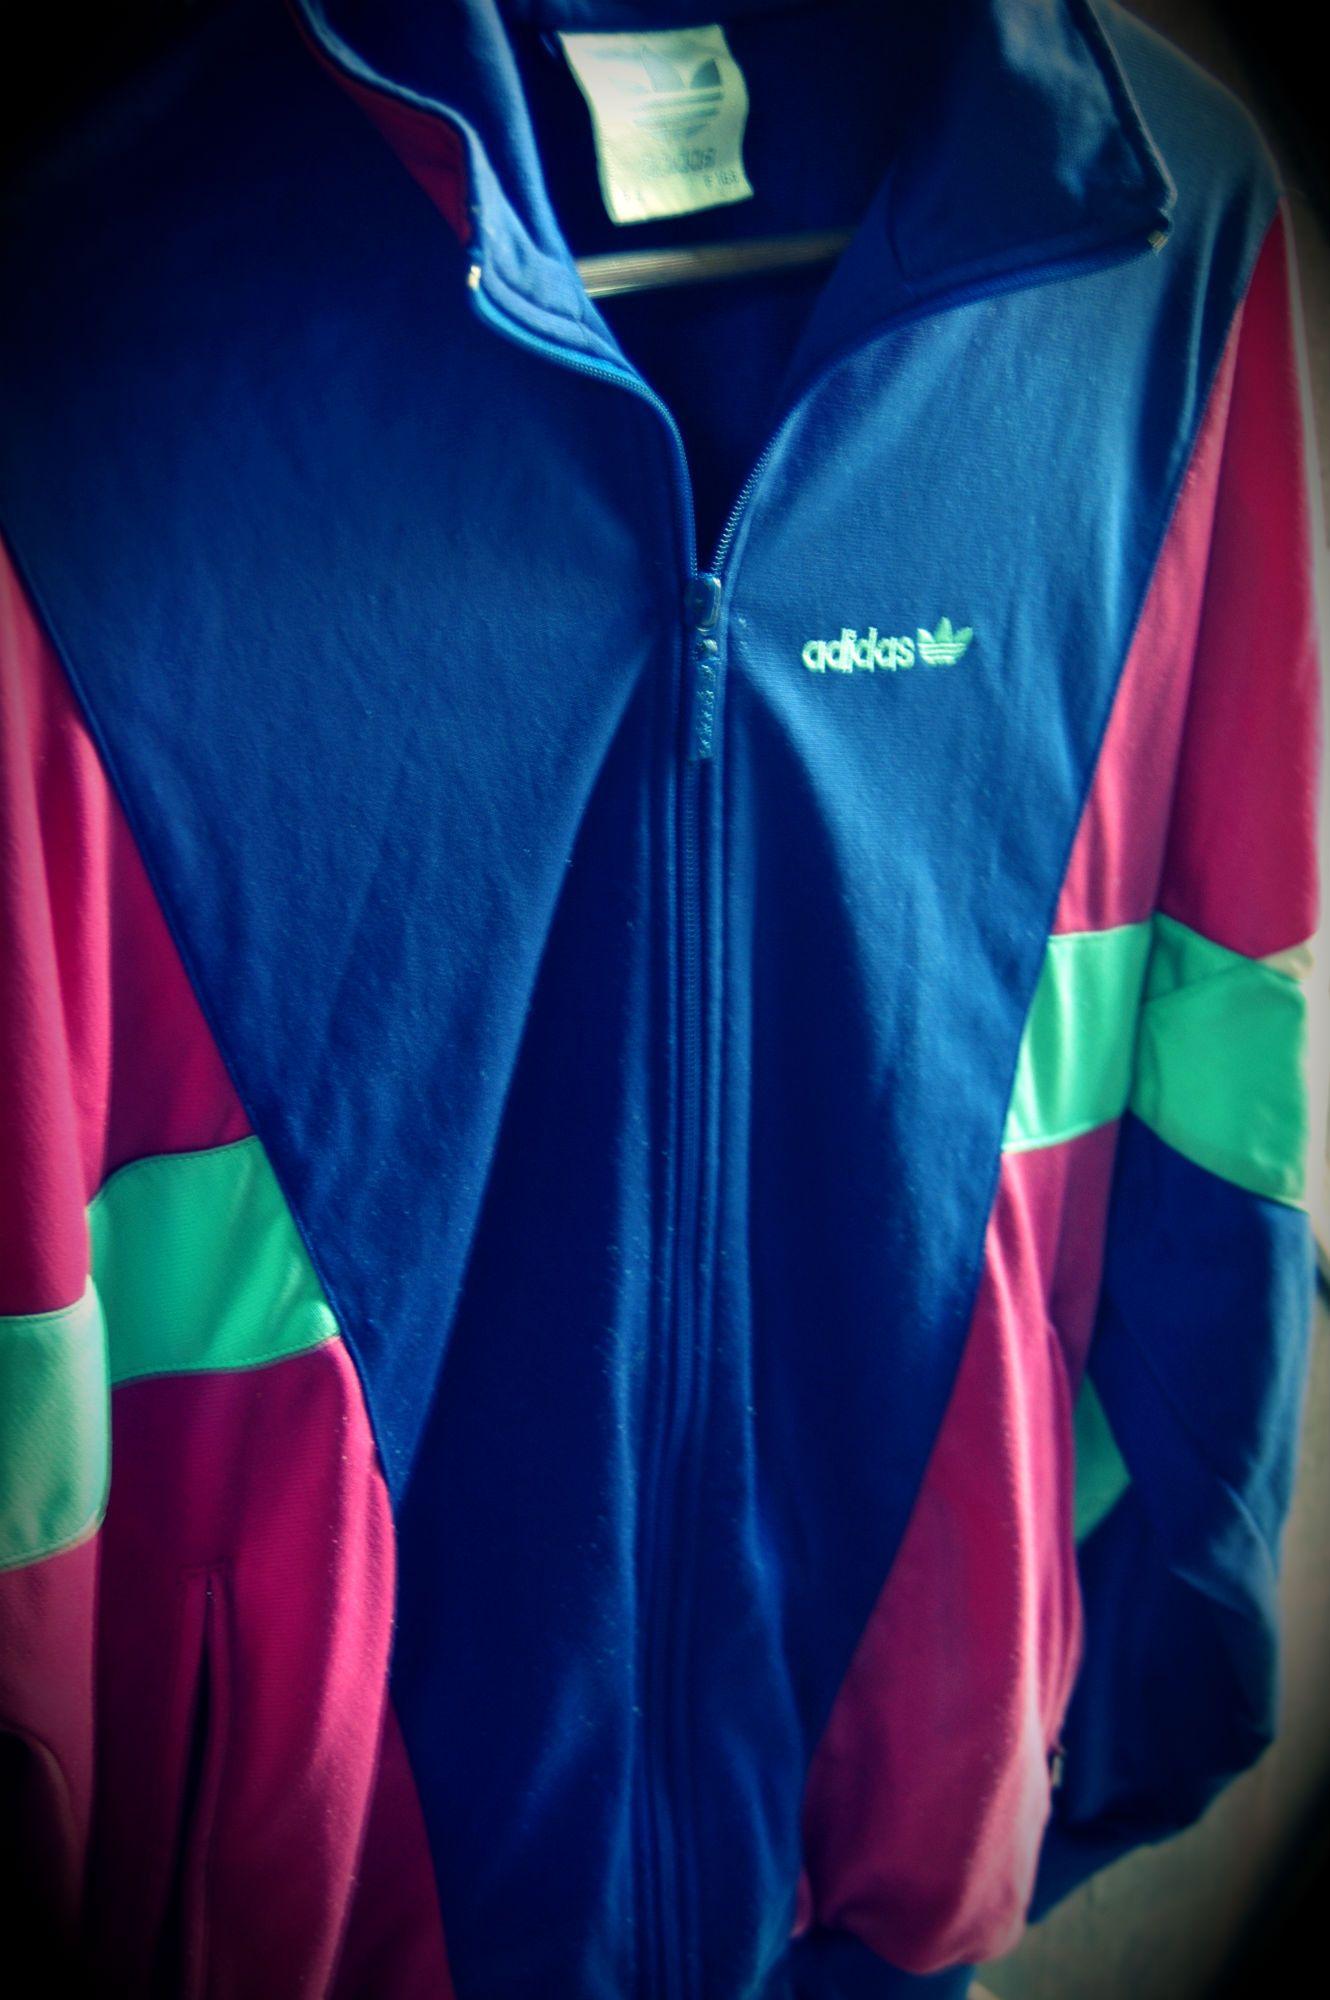 410447c9e6603 super chaqueta adidas vintage pero a precio reciclamente  )